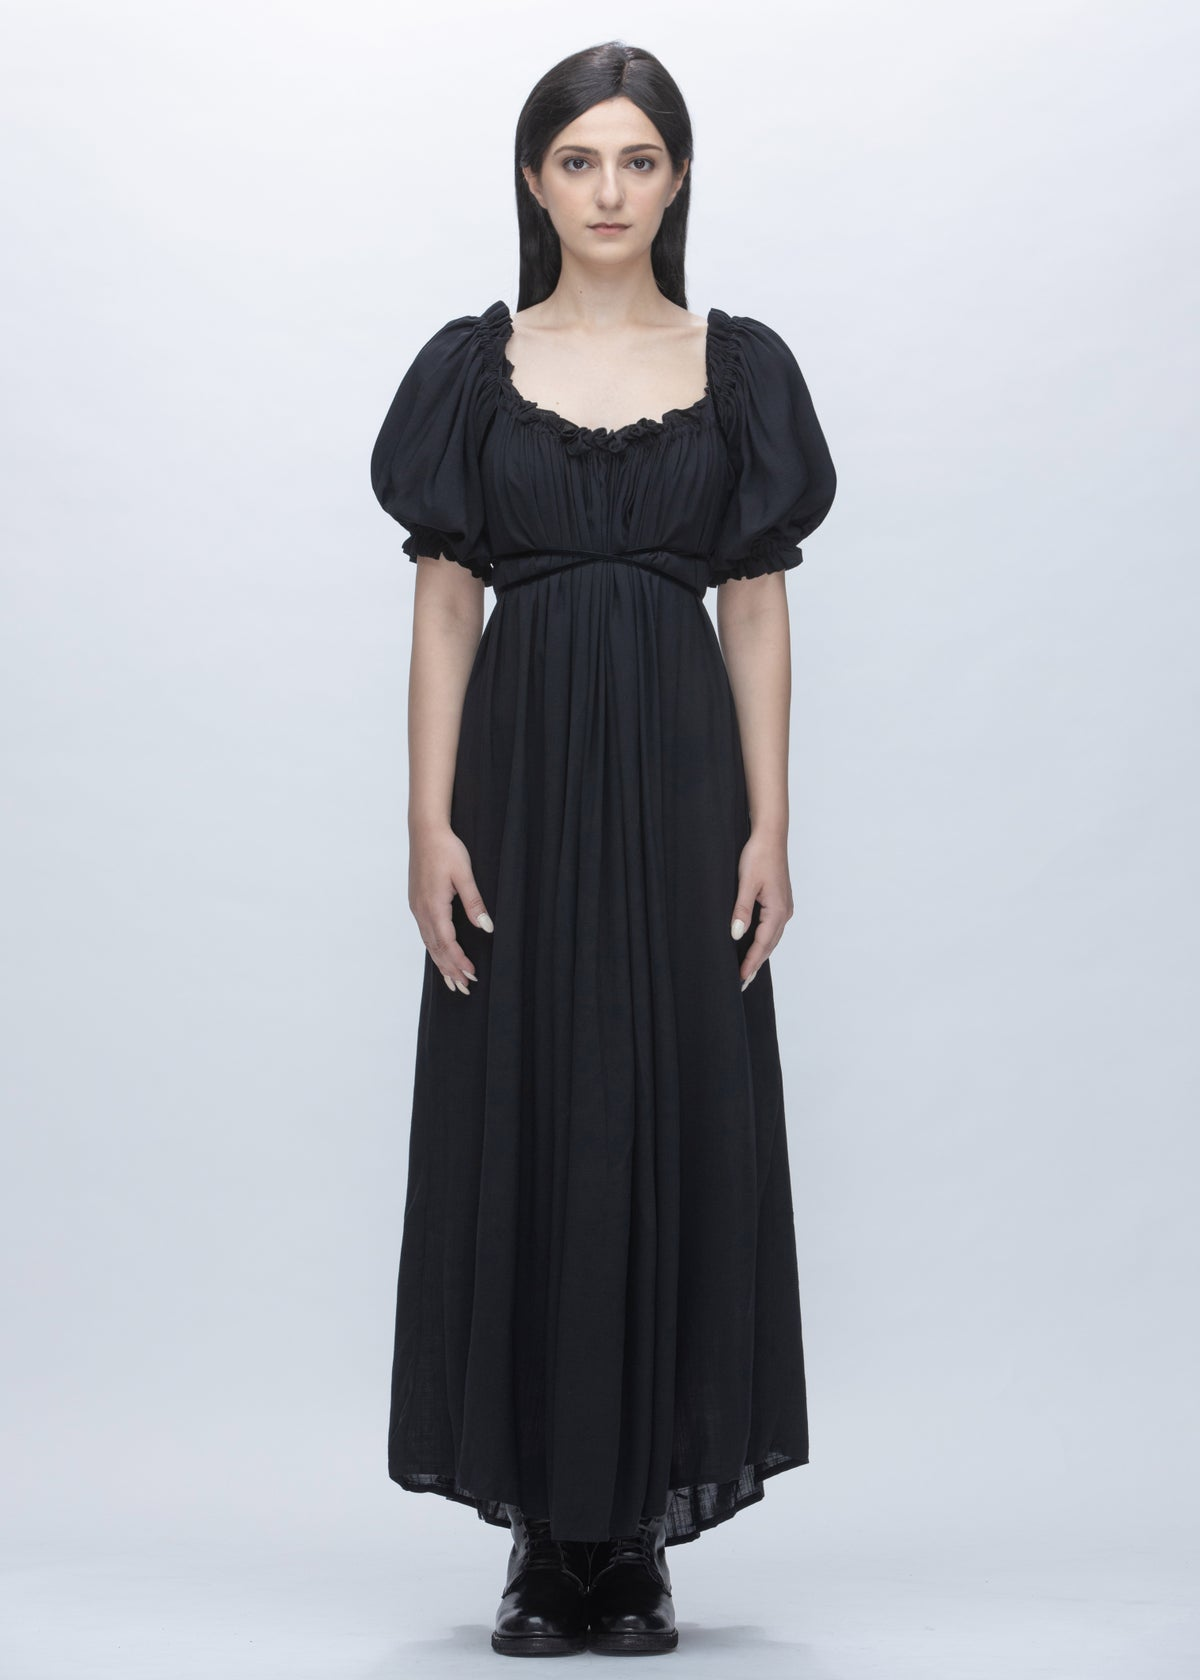 Image of Suri Lace Up Multi Way Dress in Black